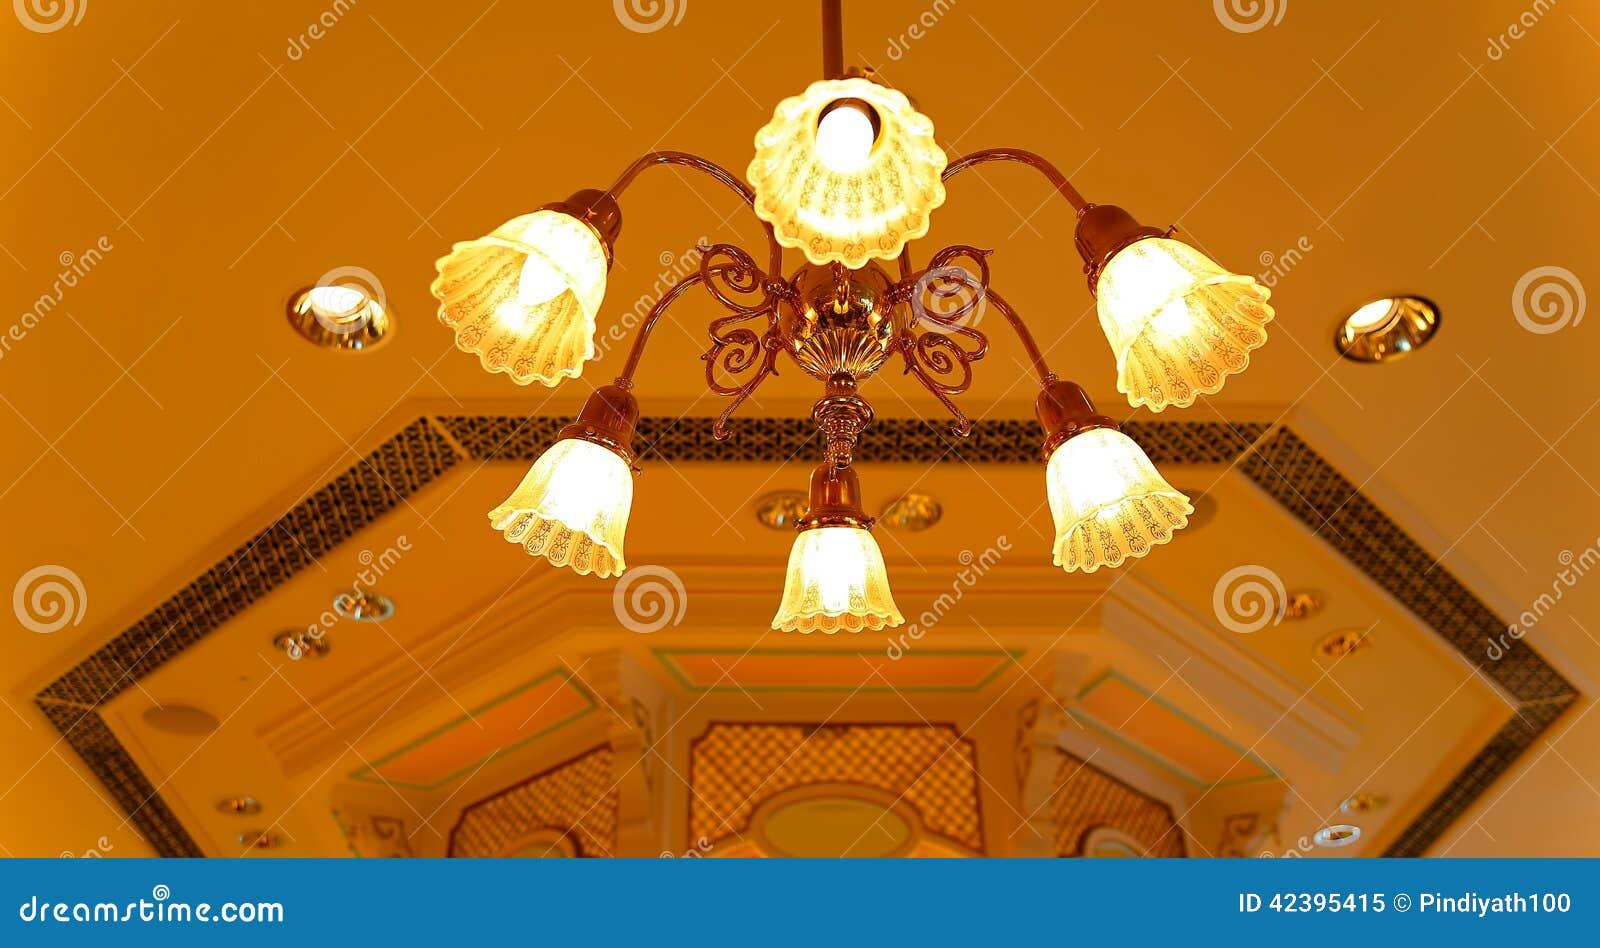 Cystal light fixture on ceiling